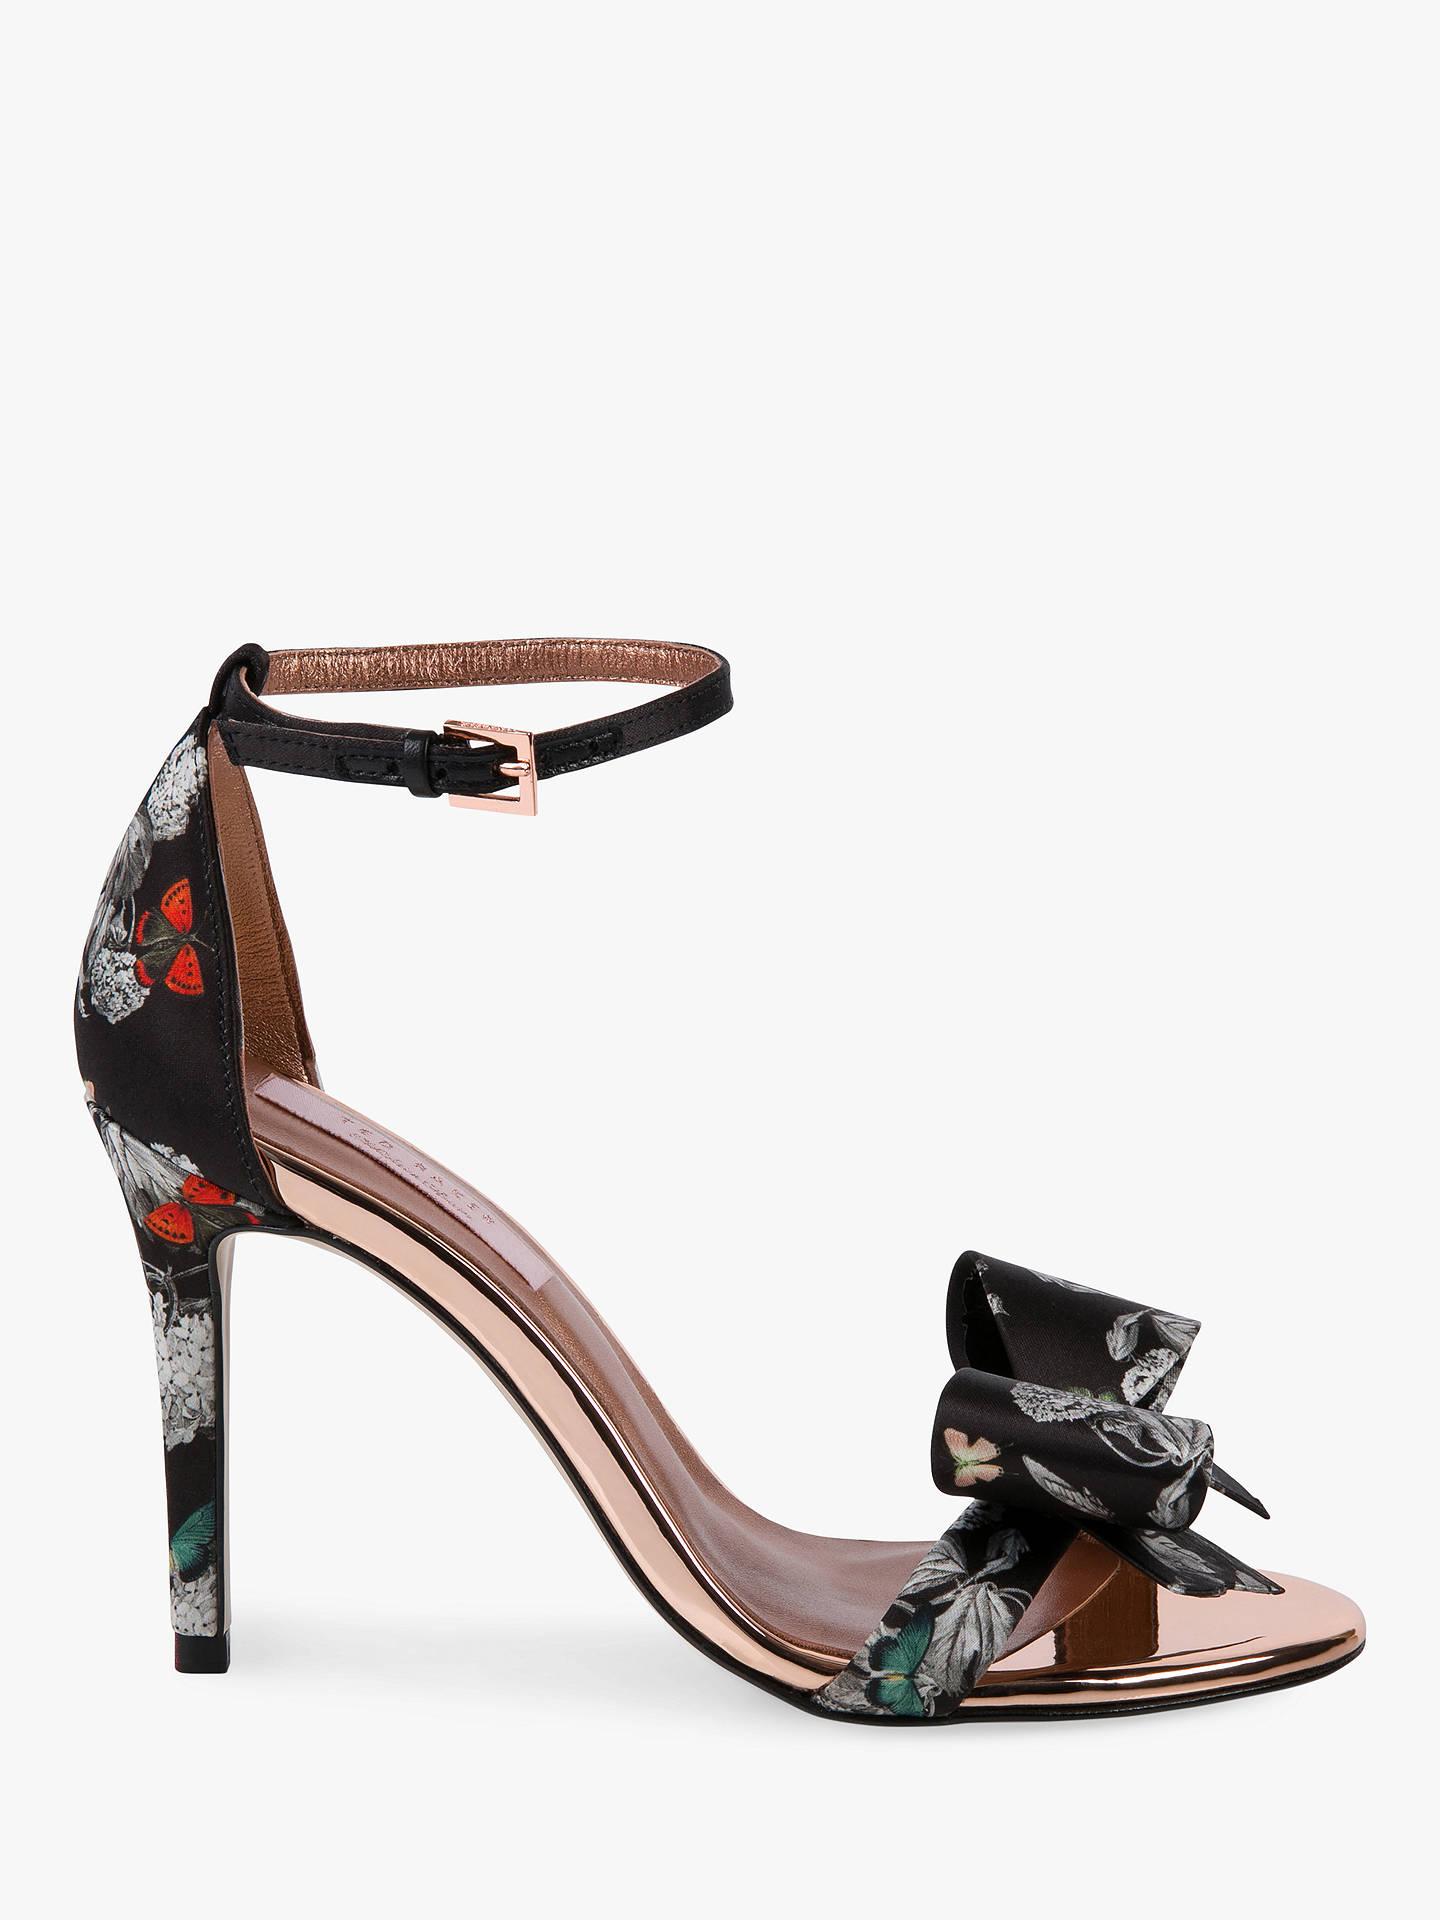 e3a26a74576 Buy Ted Baker Bowdalp Narnia Stiletto Heel Sandals